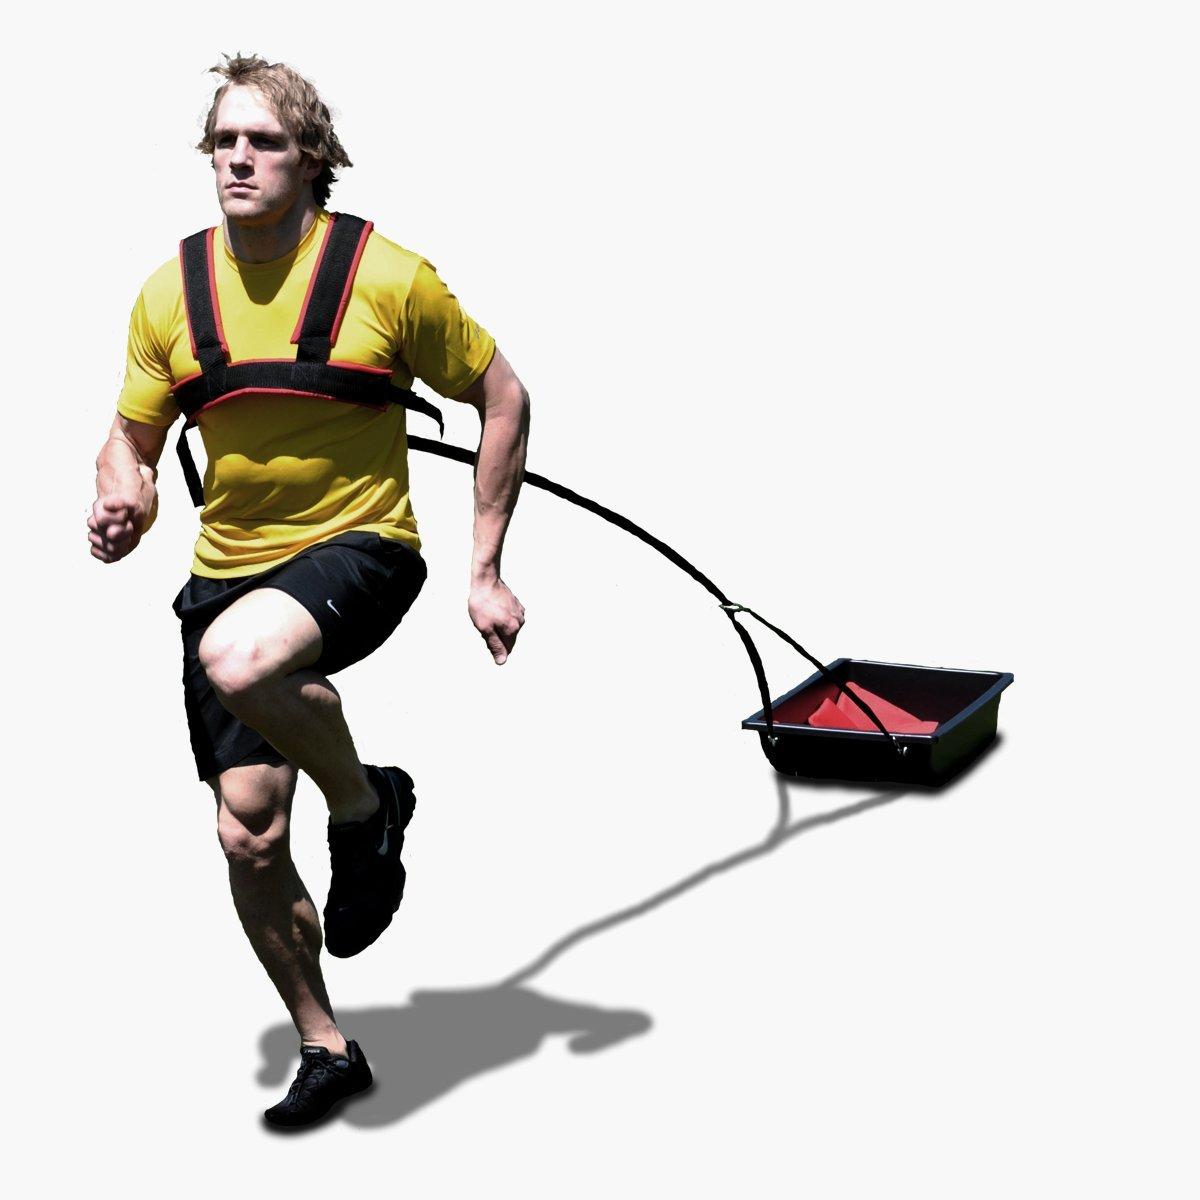 Speedster Team Speed Training System - TEAM 10 by SPEEDSTER (Image #5)